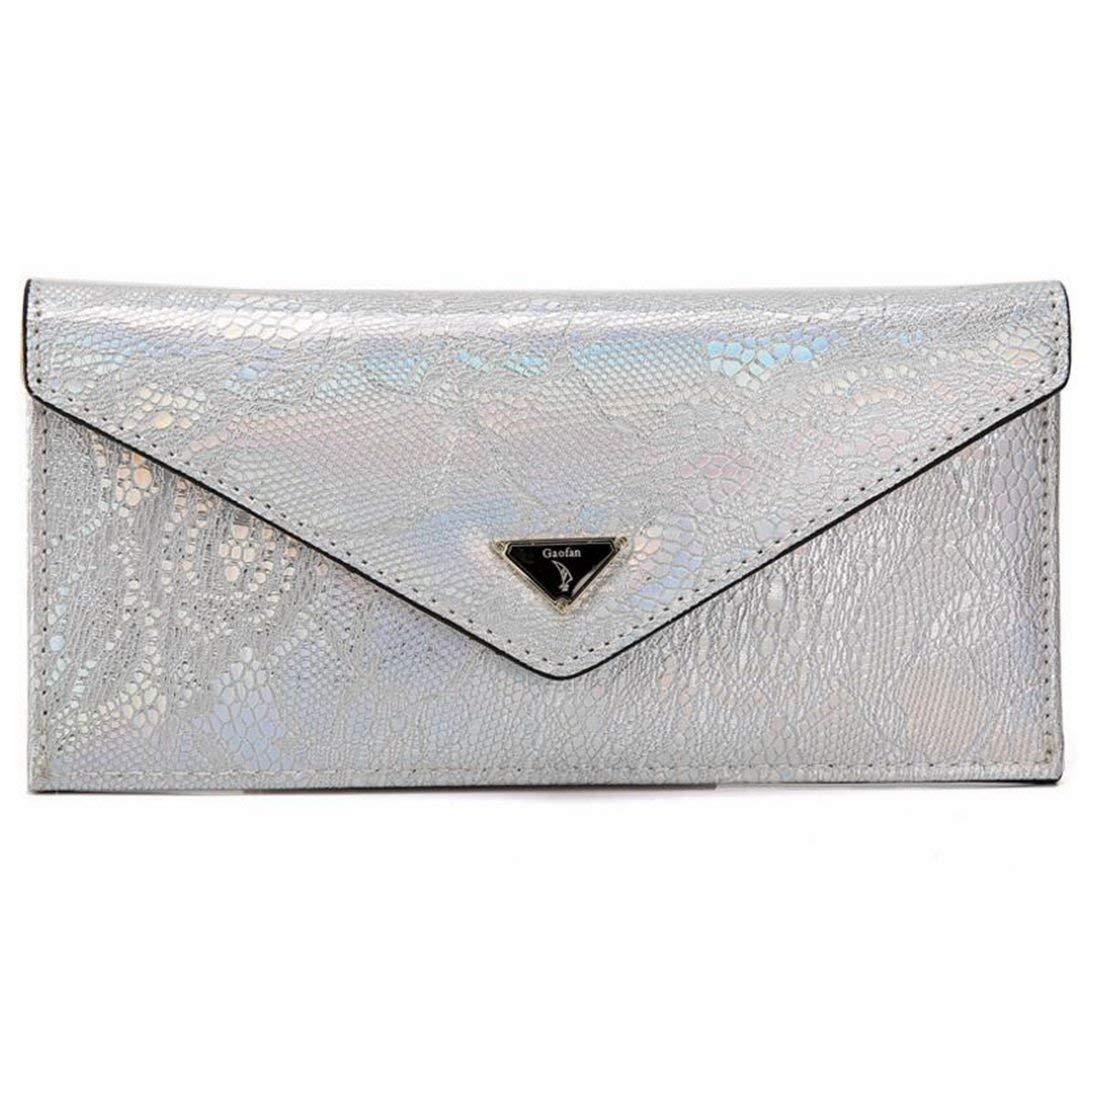 White Soft Wallet Blocking Wax Leather Designer Trifold Multi Card Organizer for Women Handbag (color   Silver)